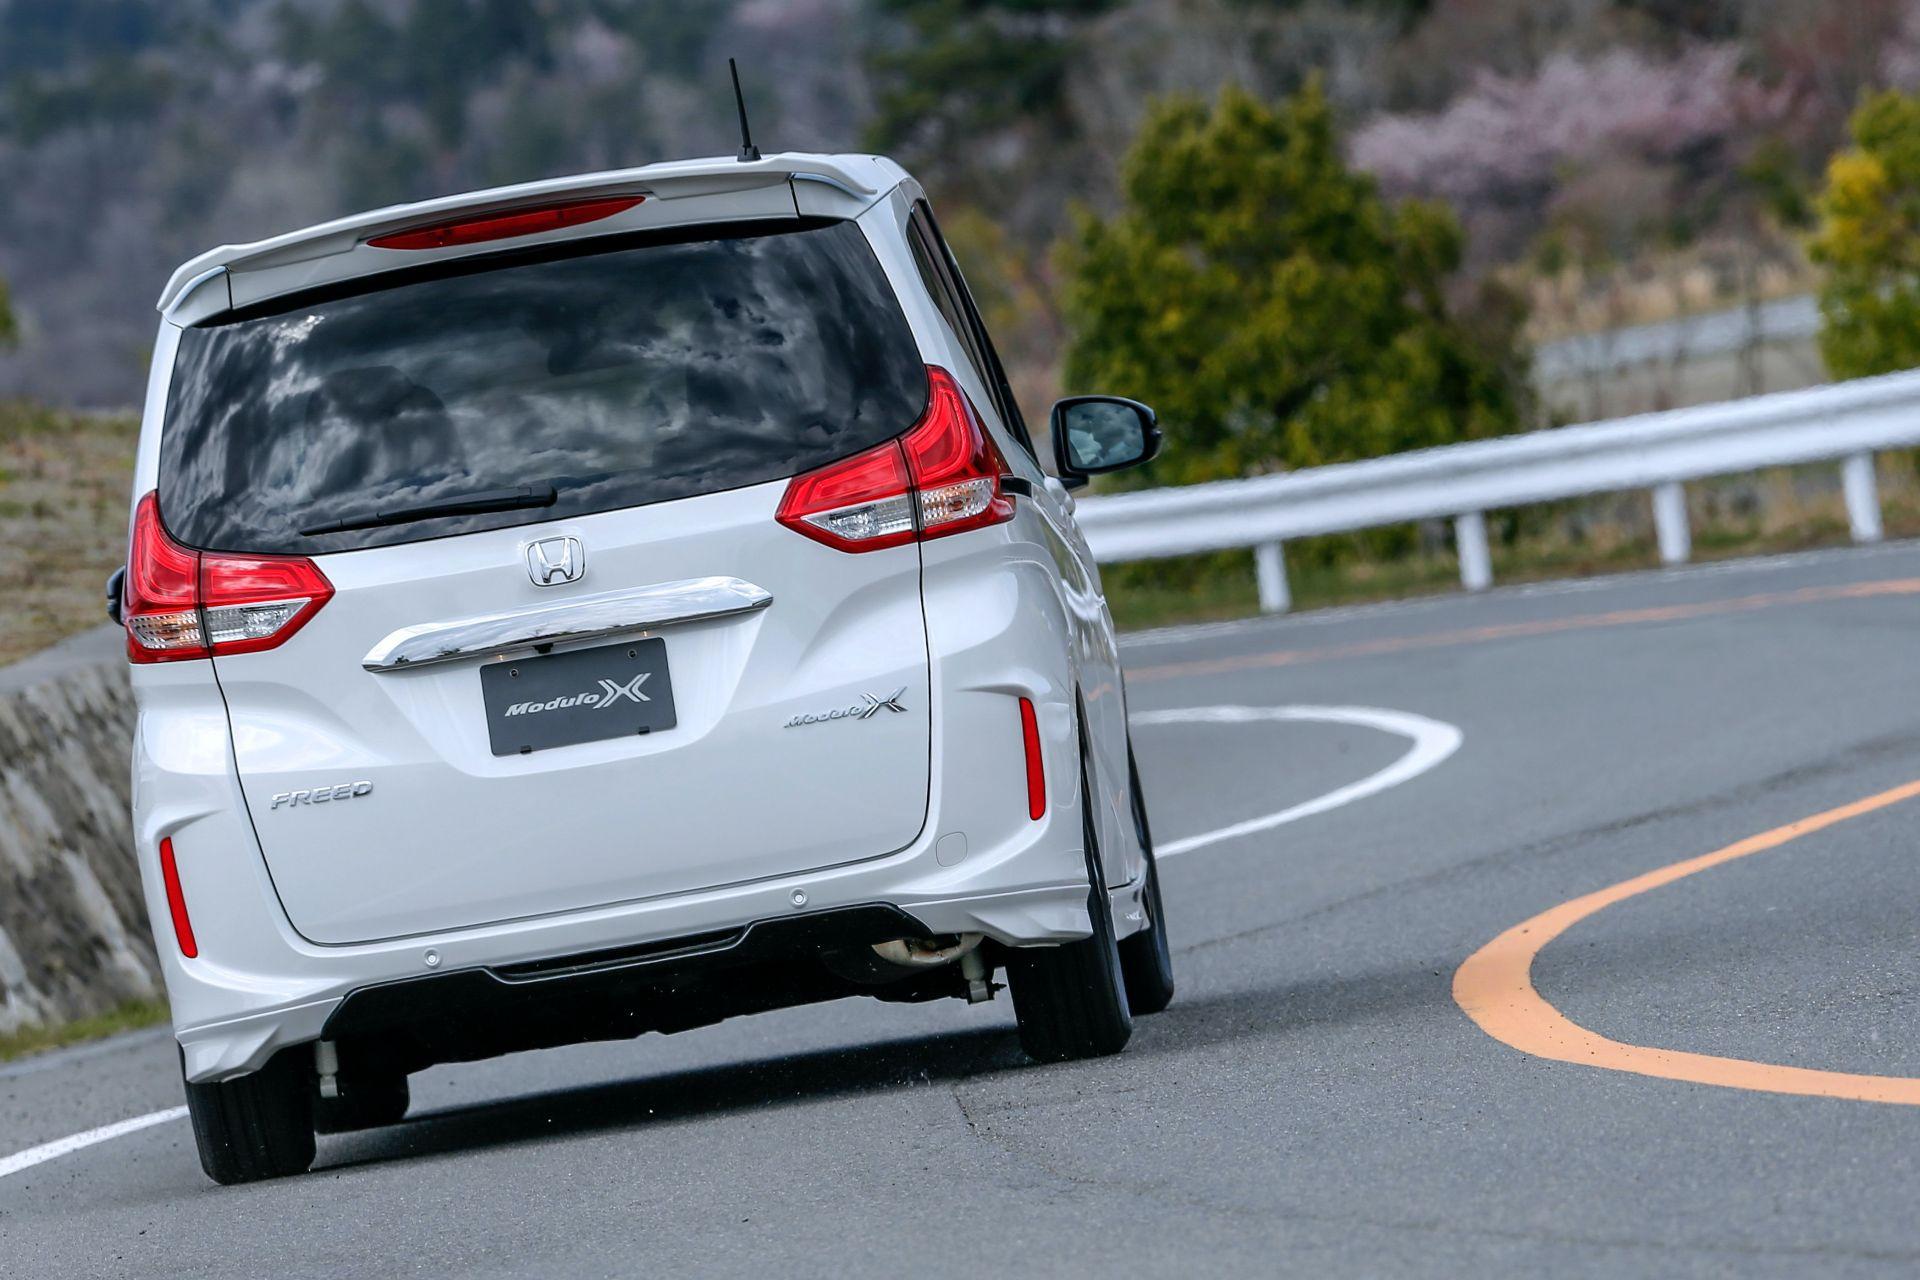 Honda-Freed-Modulo-X-Facelift-2020-30